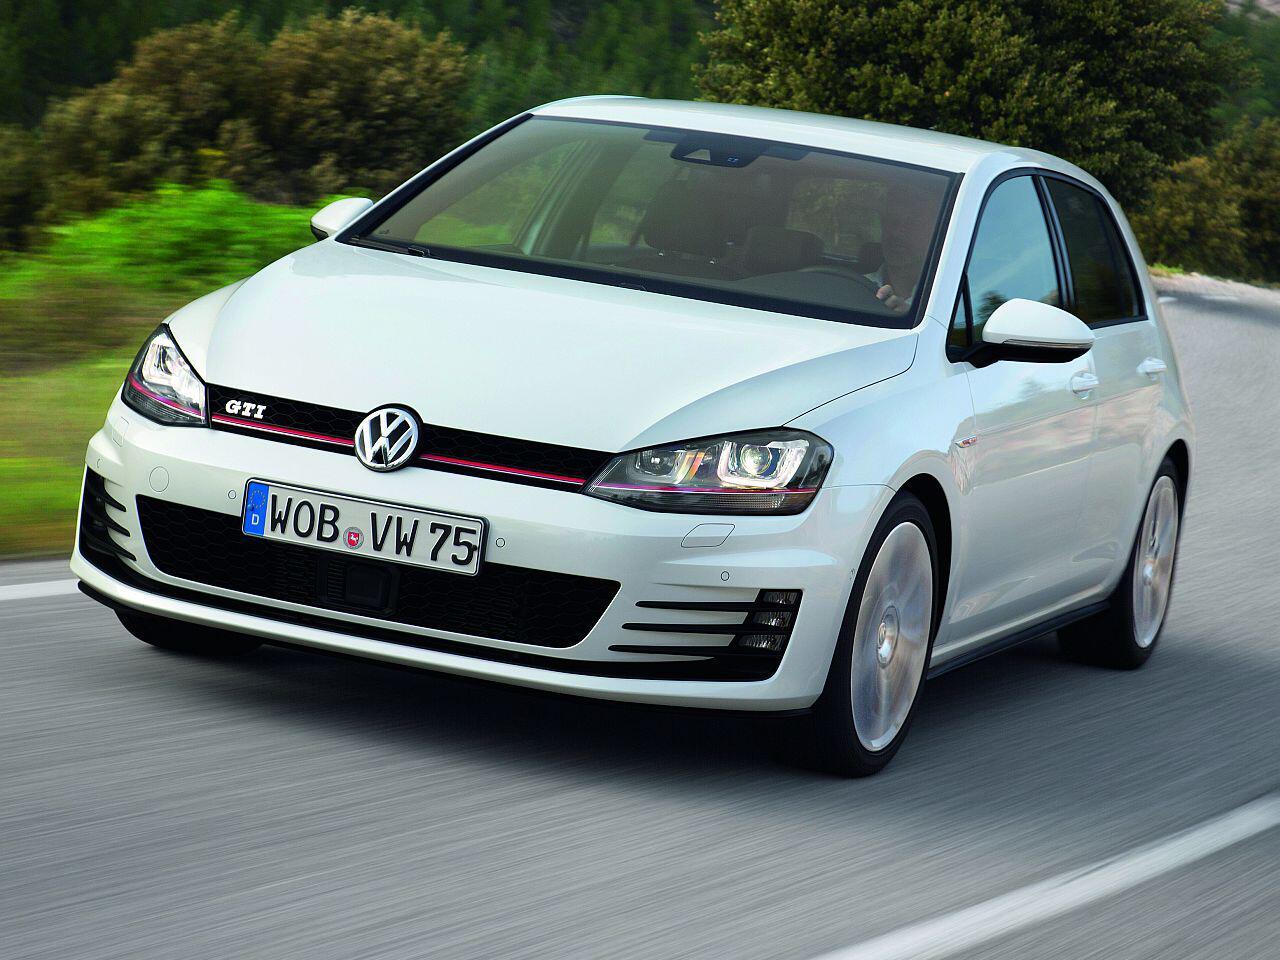 Bild zu Platz 6: VW Golf GTI